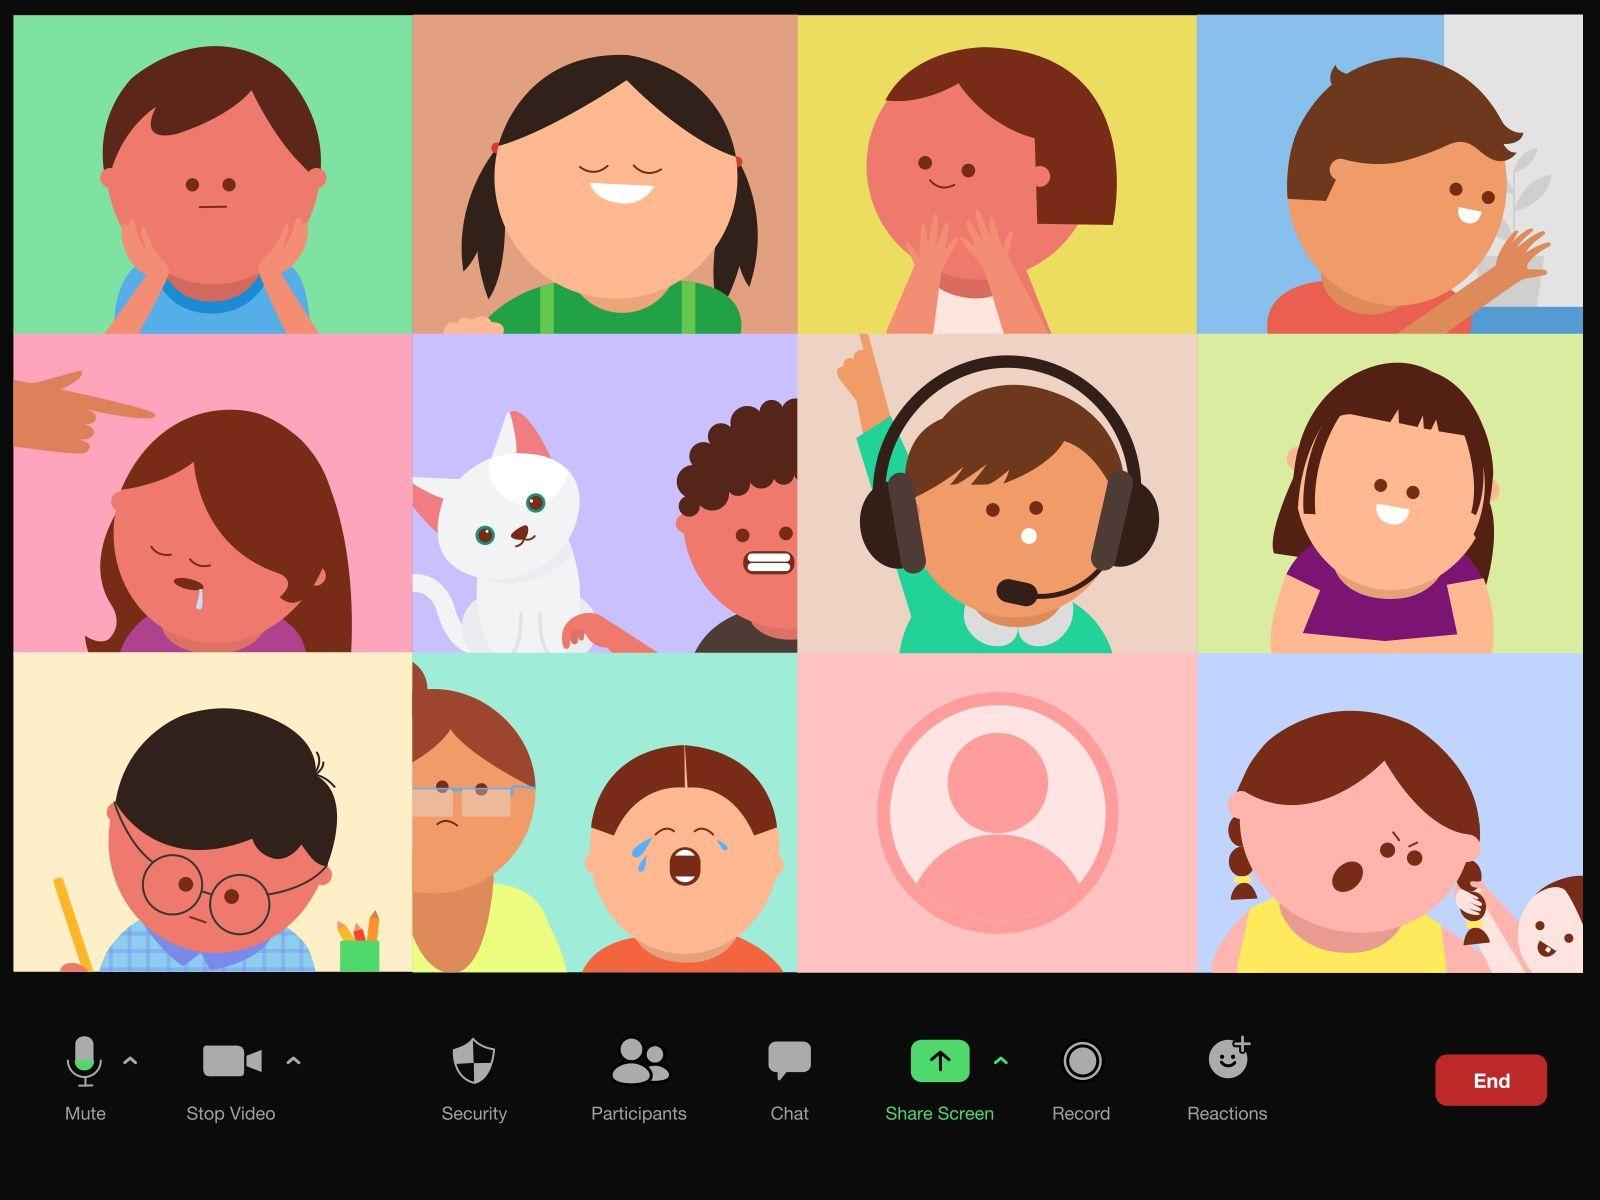 Kids in a Zoom meeting in 2020 Digital illustration